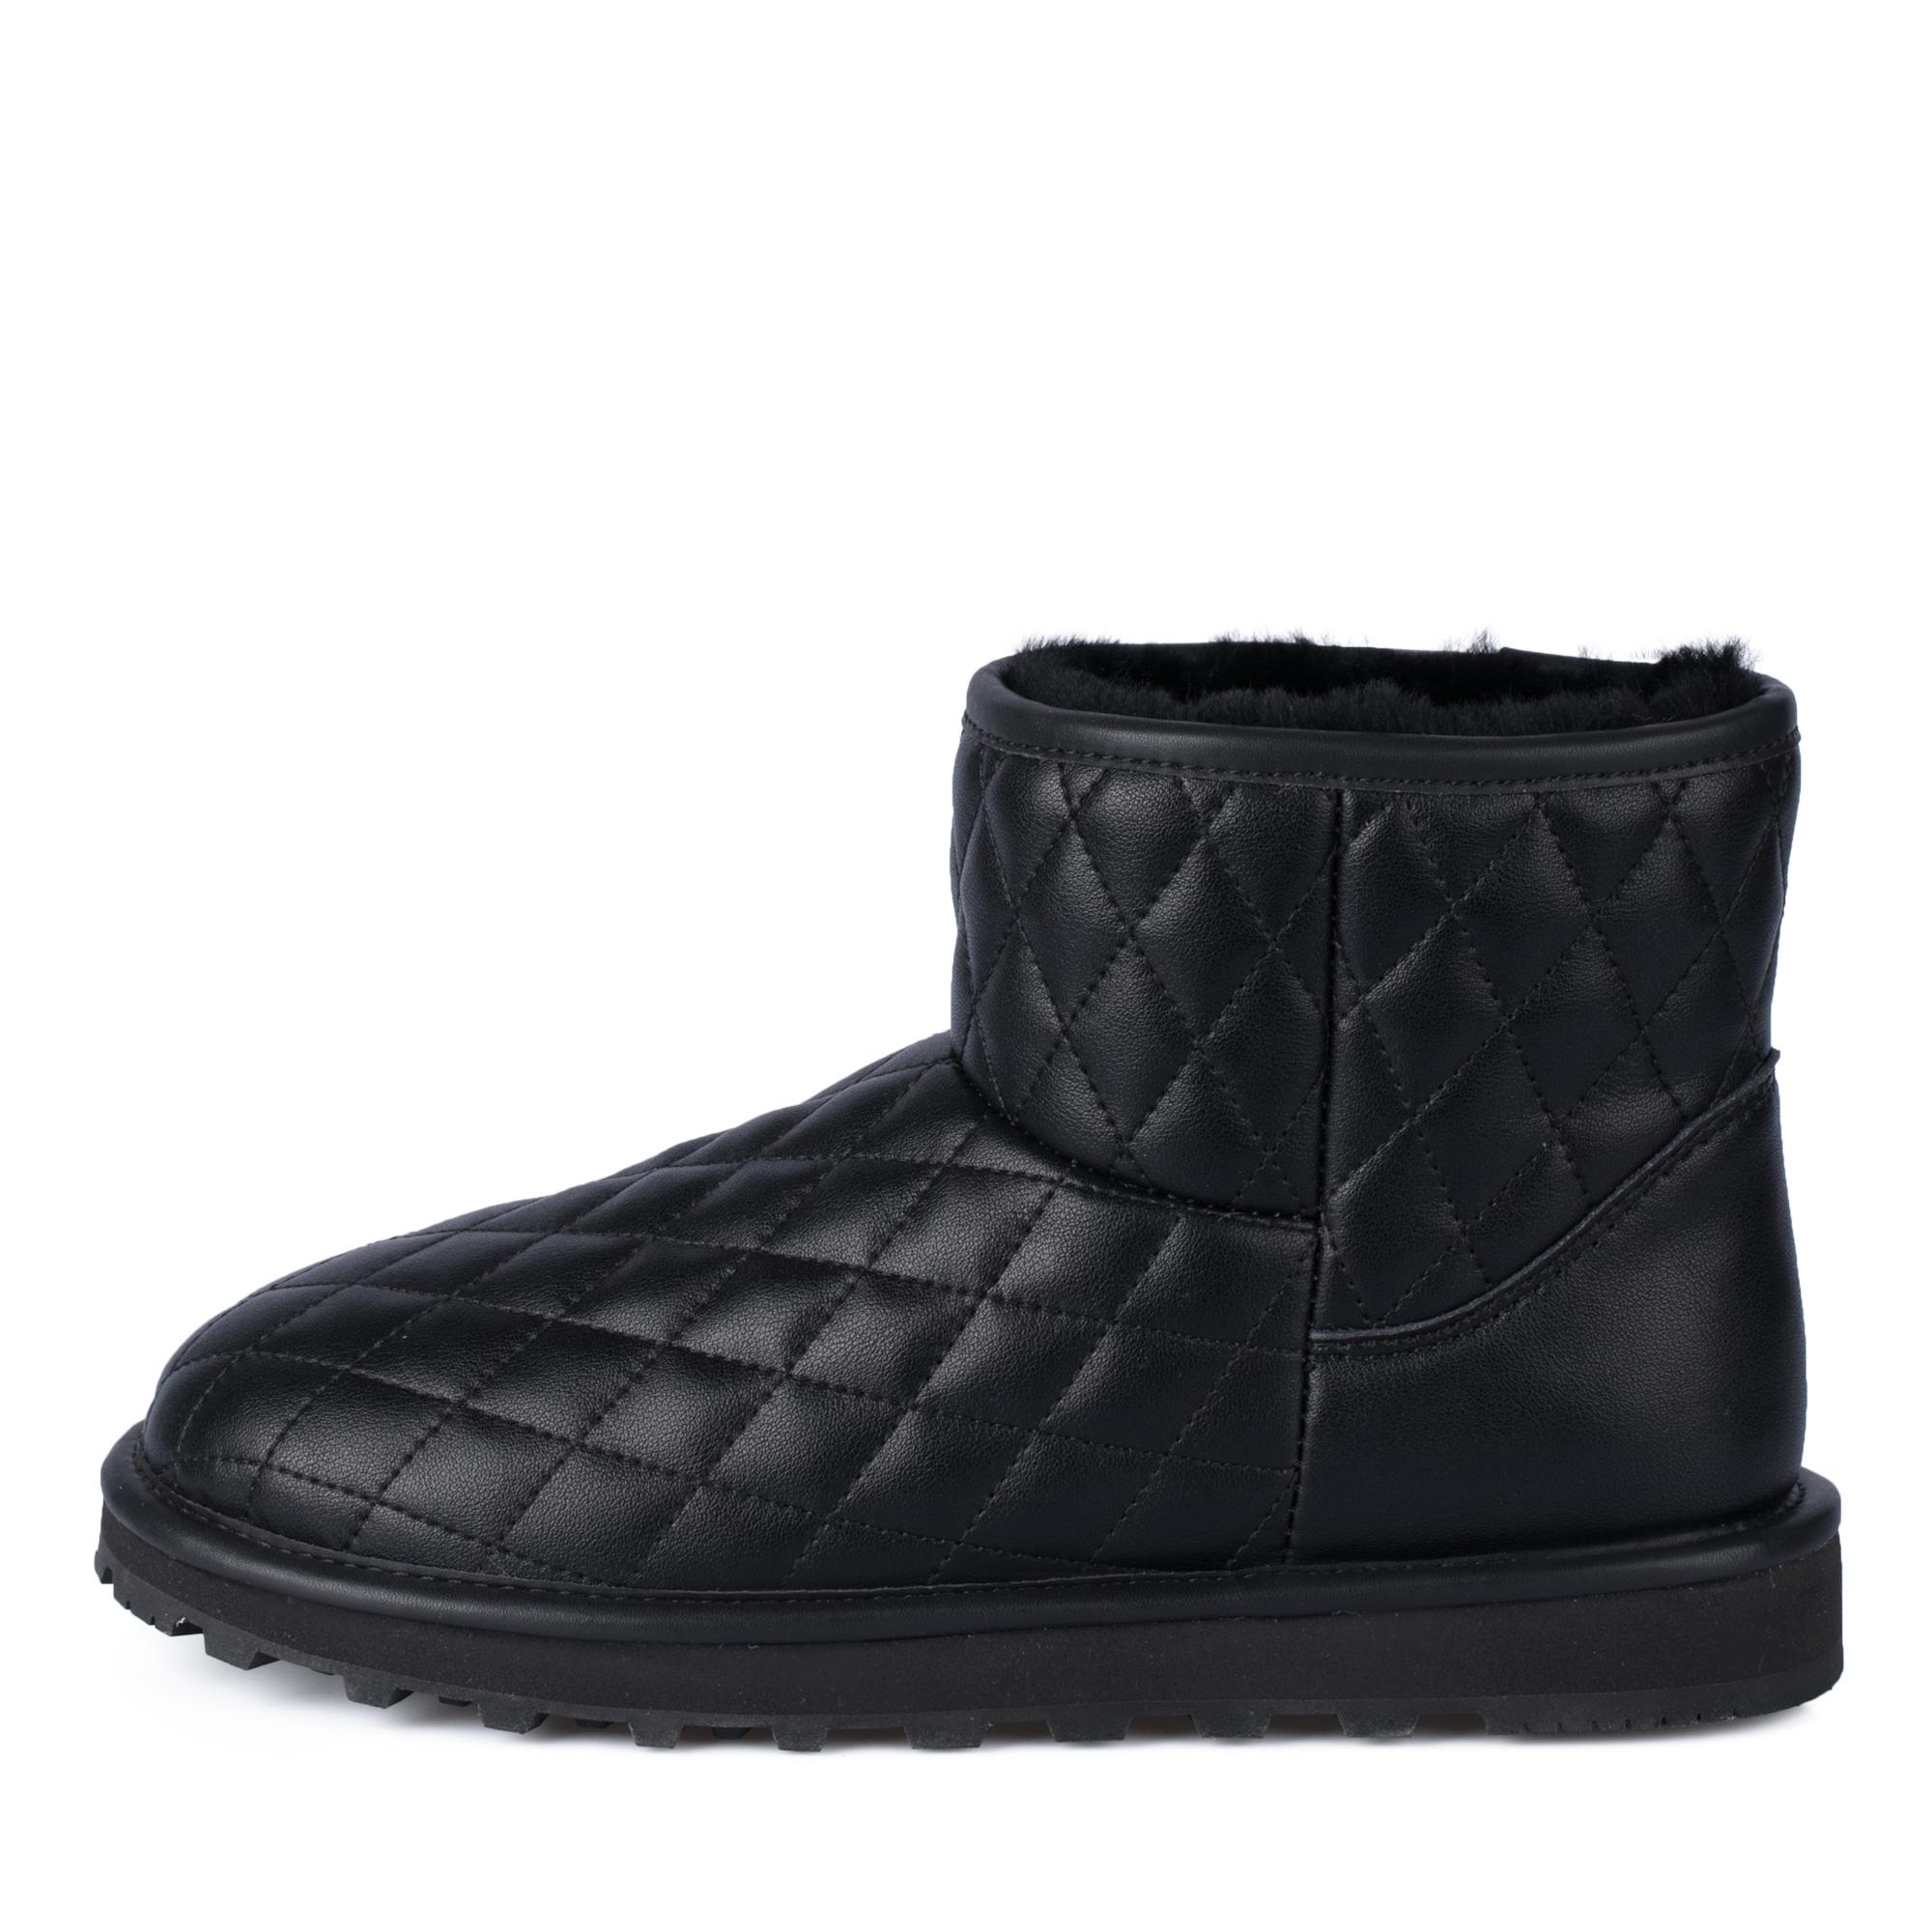 Ботинки Thomas Munz 233-970A-3102